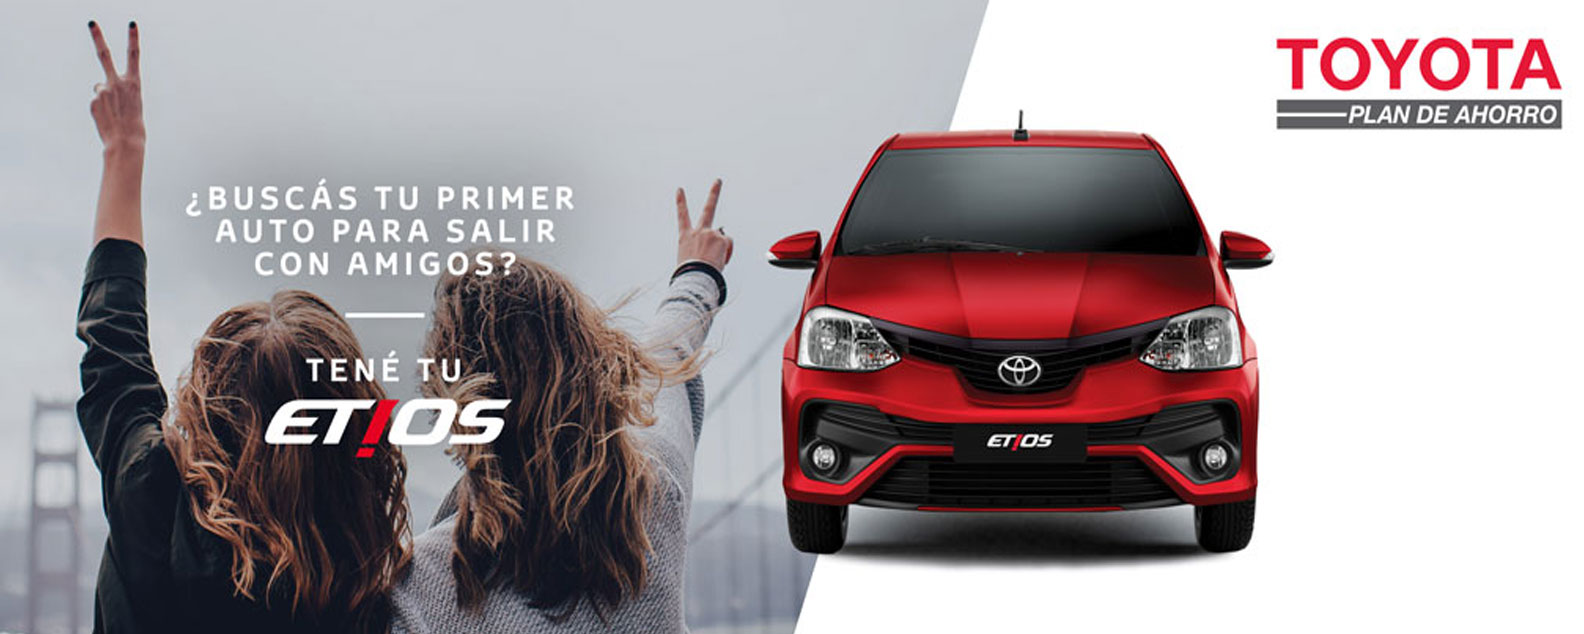 Toyota Etios Plan de Ahorro